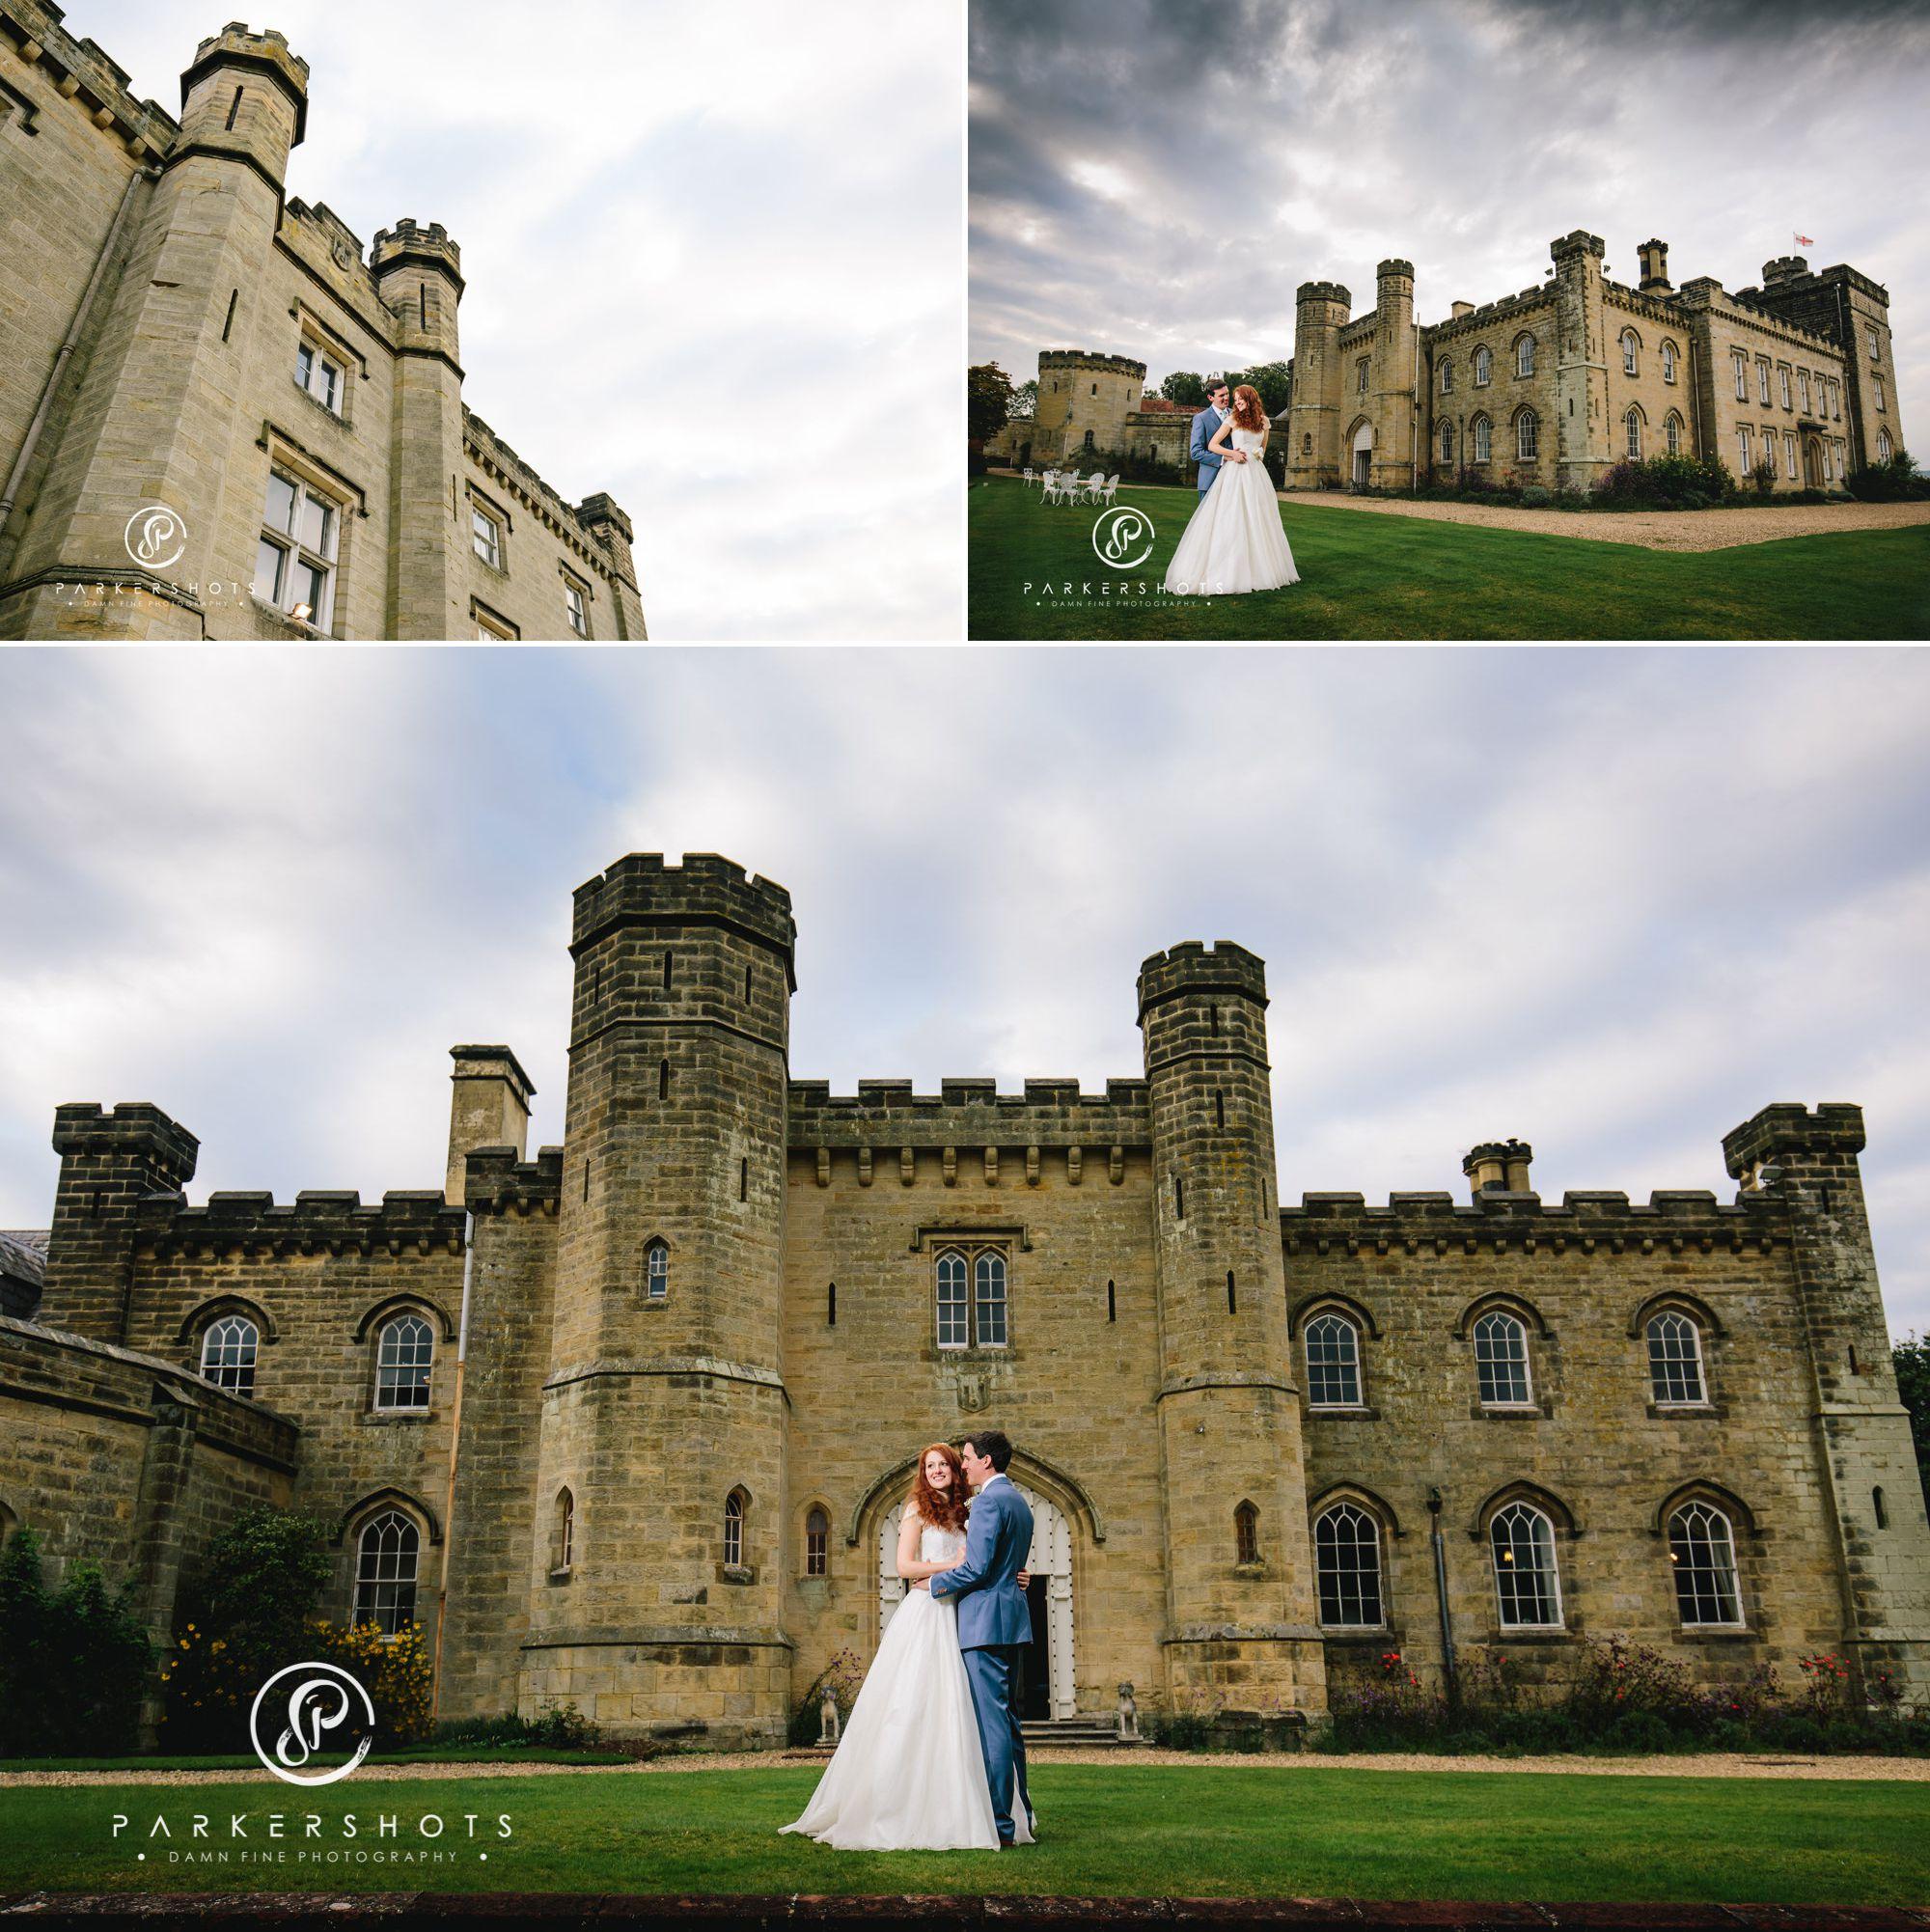 Chiddingstone_Castle_Wedding_Photographer 20